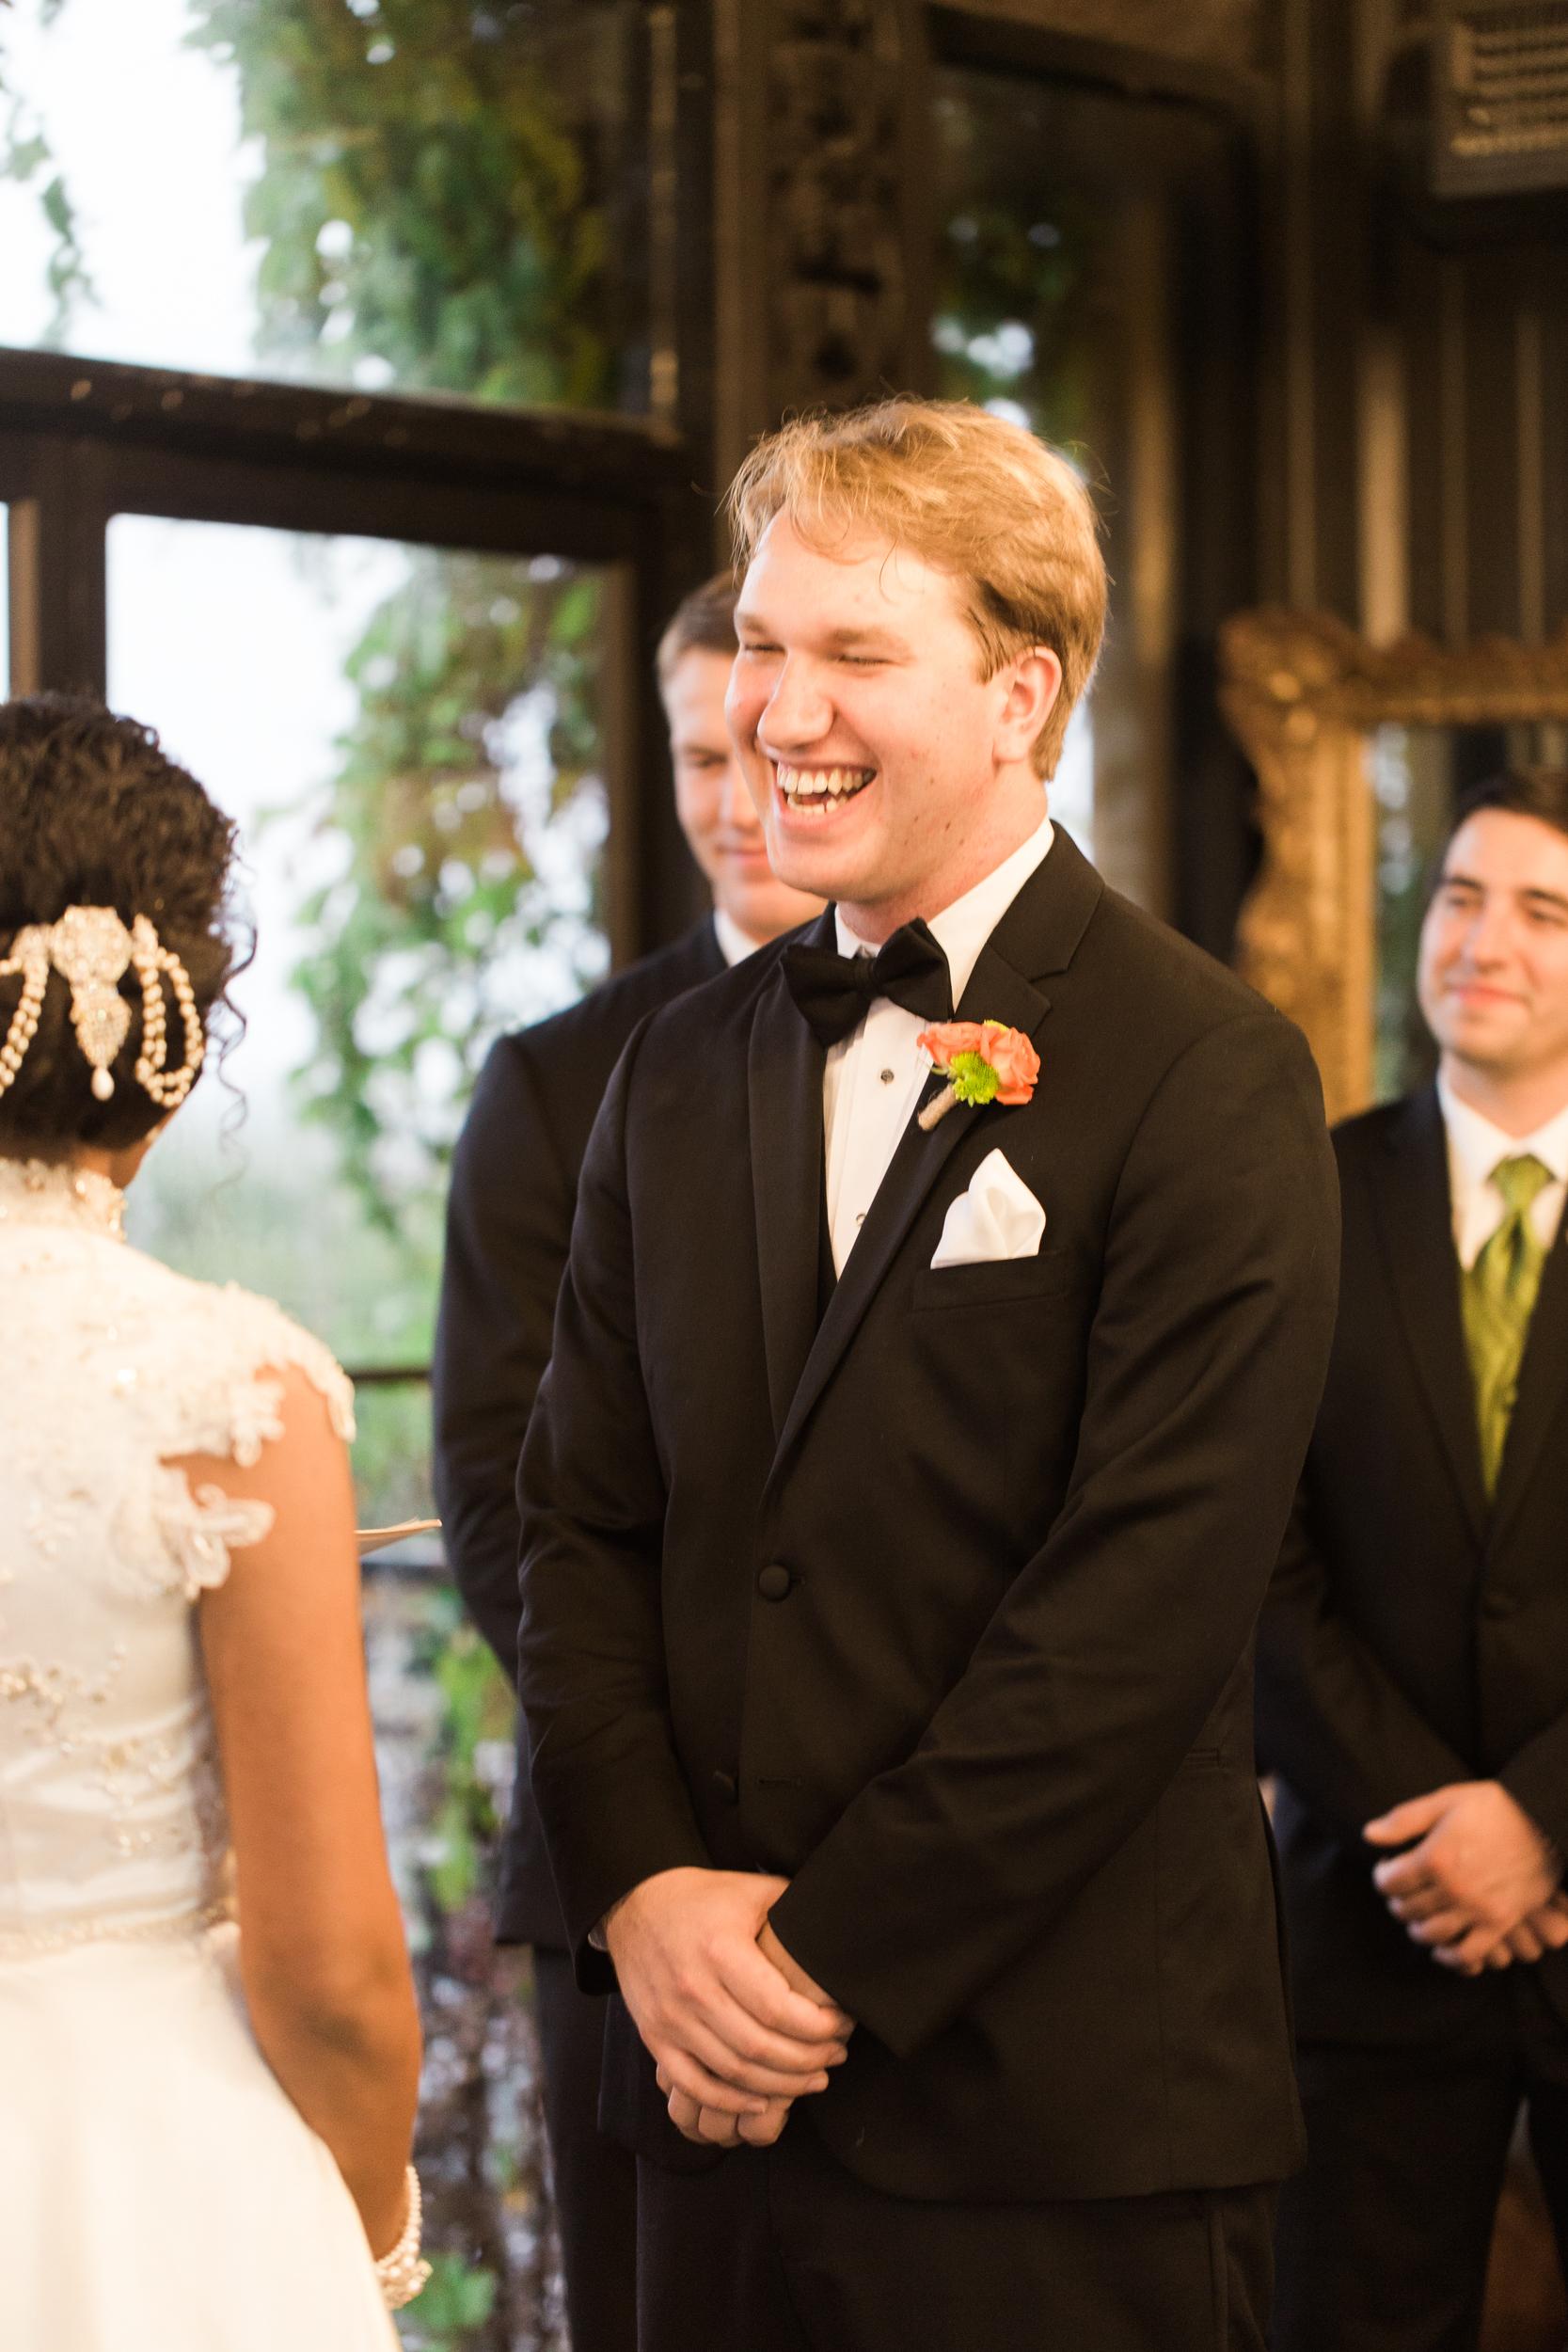 7dc51-messina-hof-wedding-34messina-hof-wedding-34.jpg